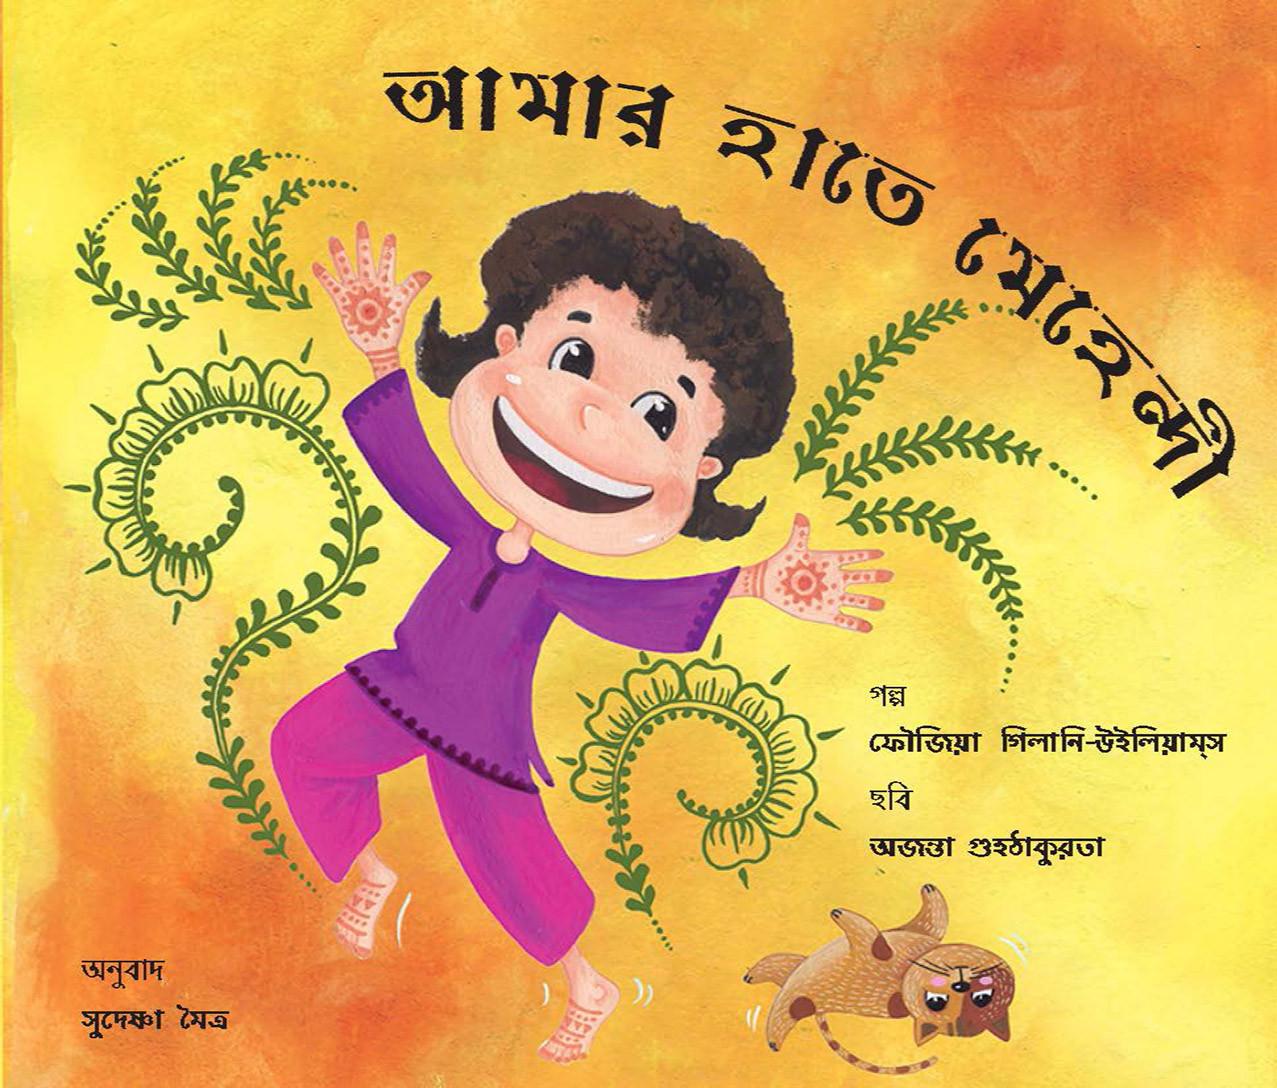 Henna on my Hands/Aamaar Haathe Mehendi (Bengali)